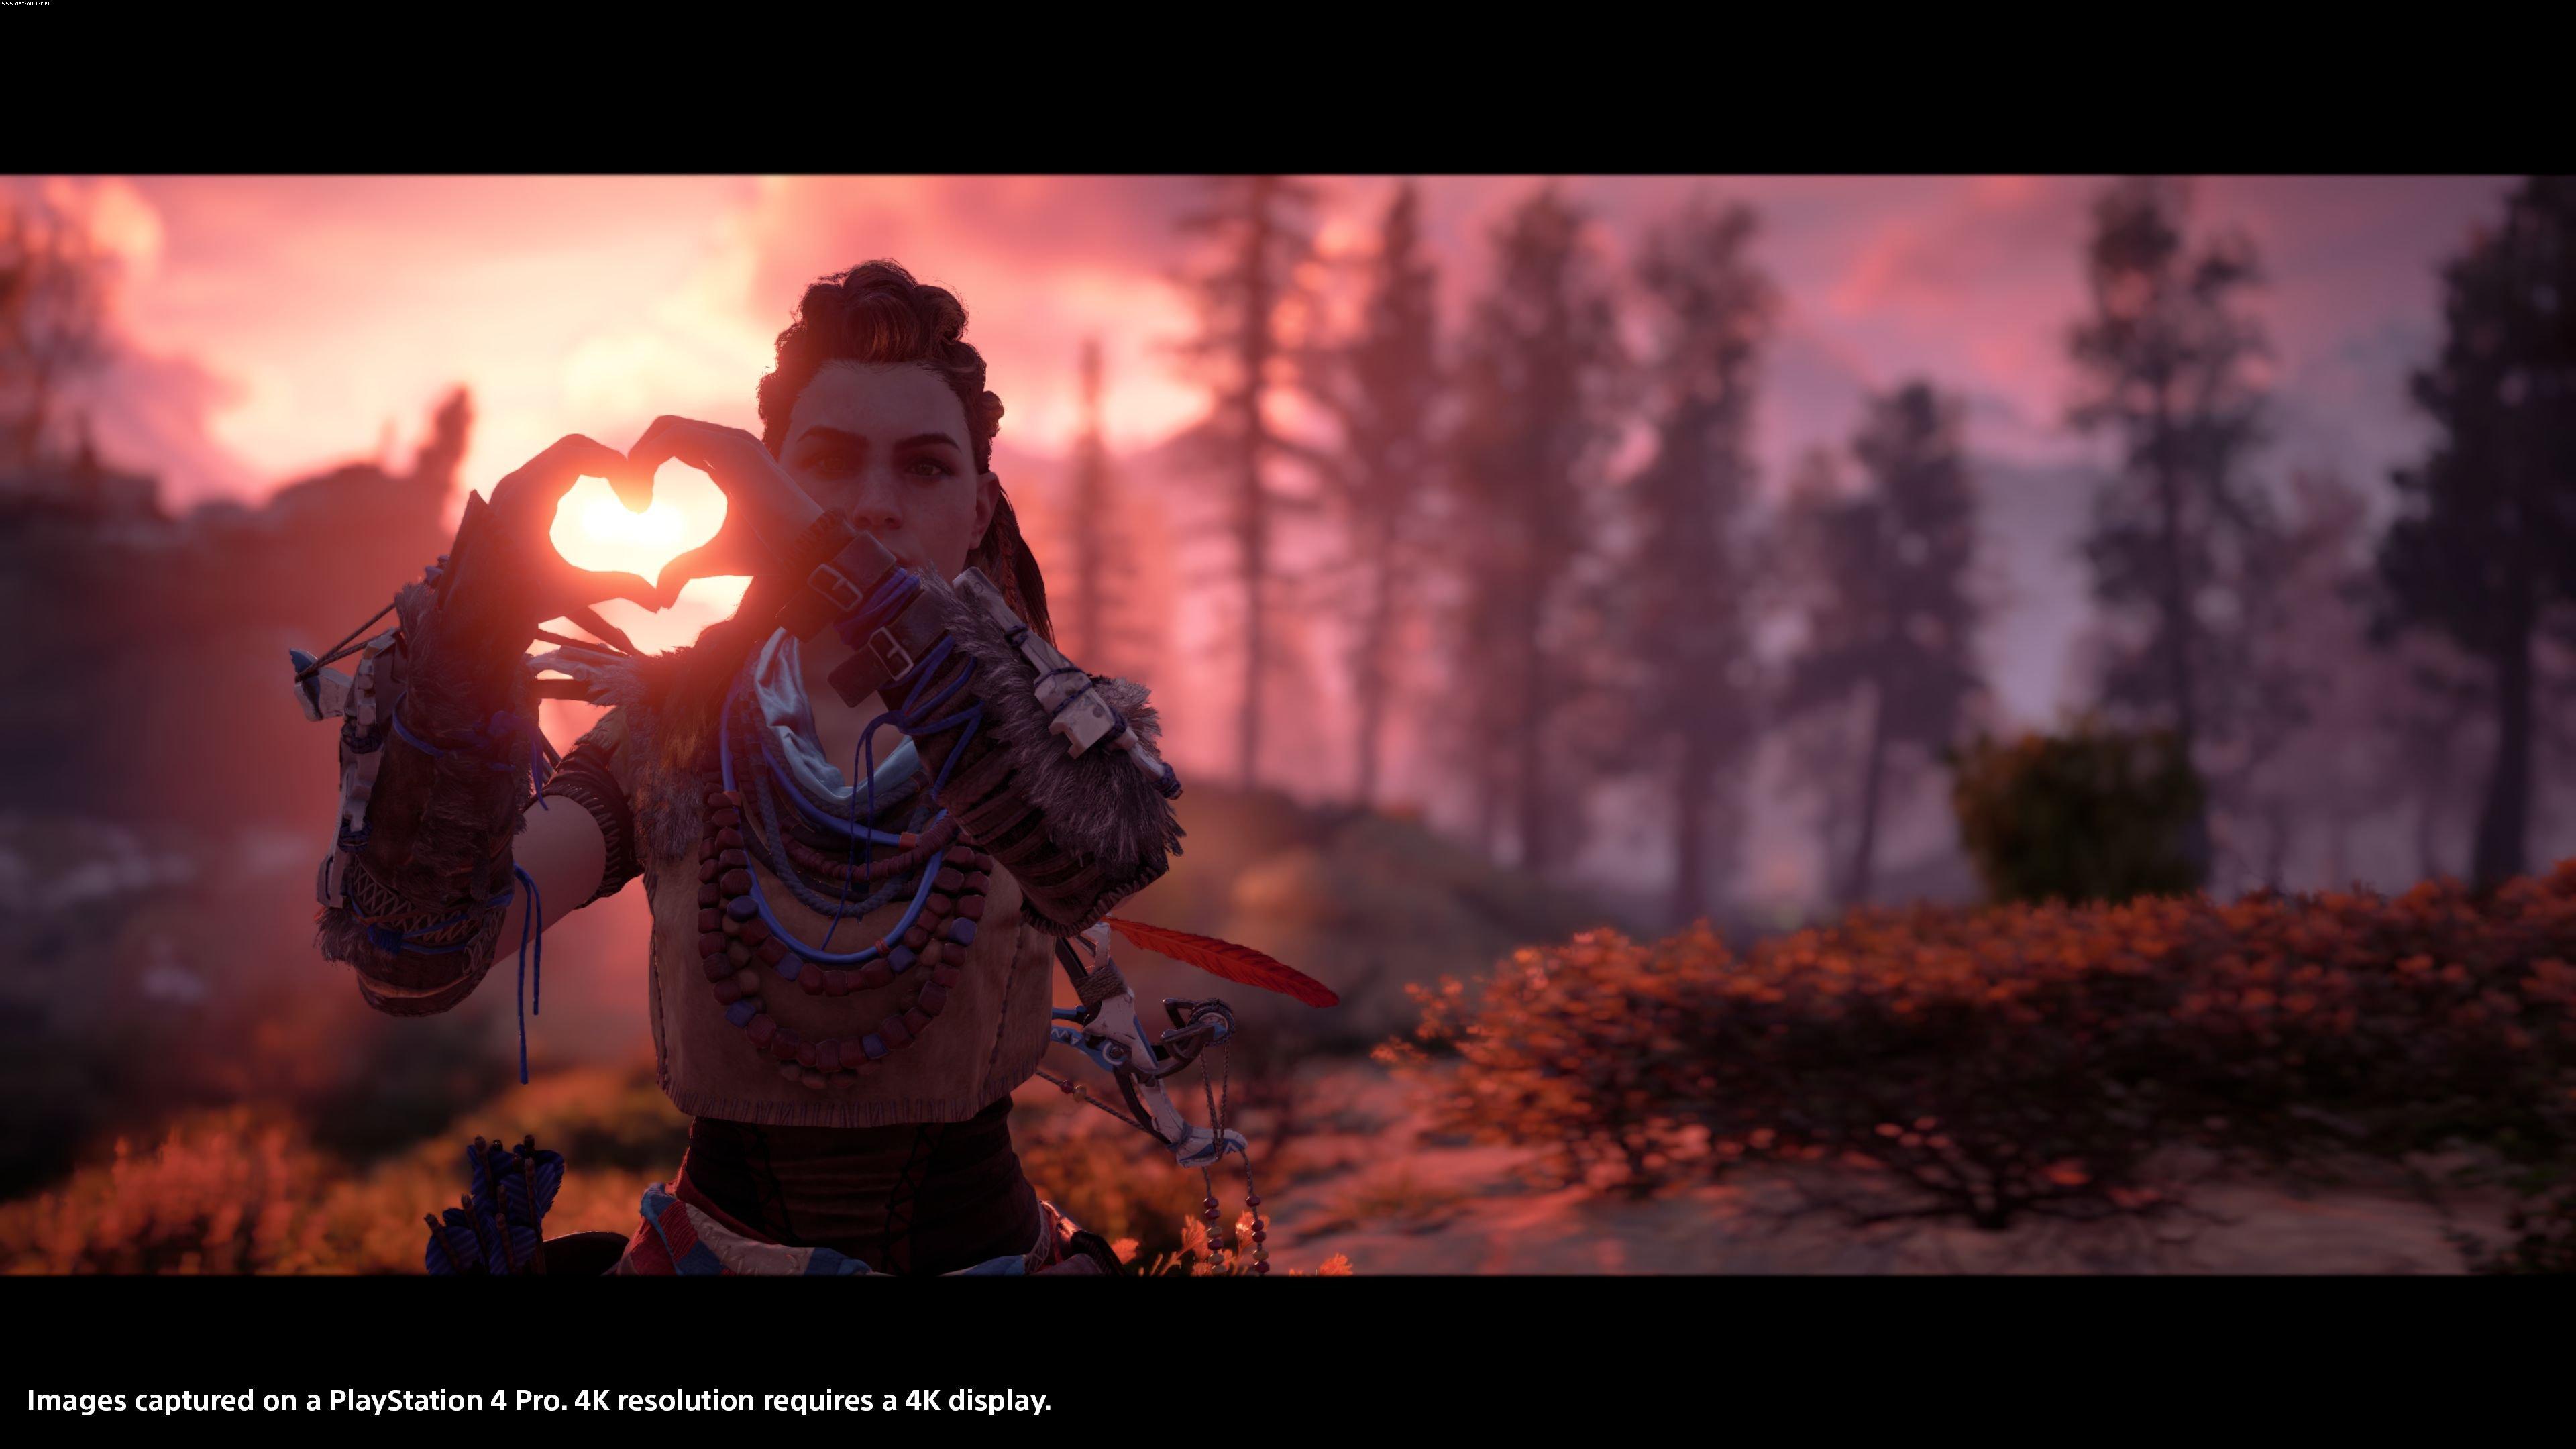 Horizon Zero Dawn PS4 Games Image 1/57, Guerrilla Games, Sony Interactive Entertainment